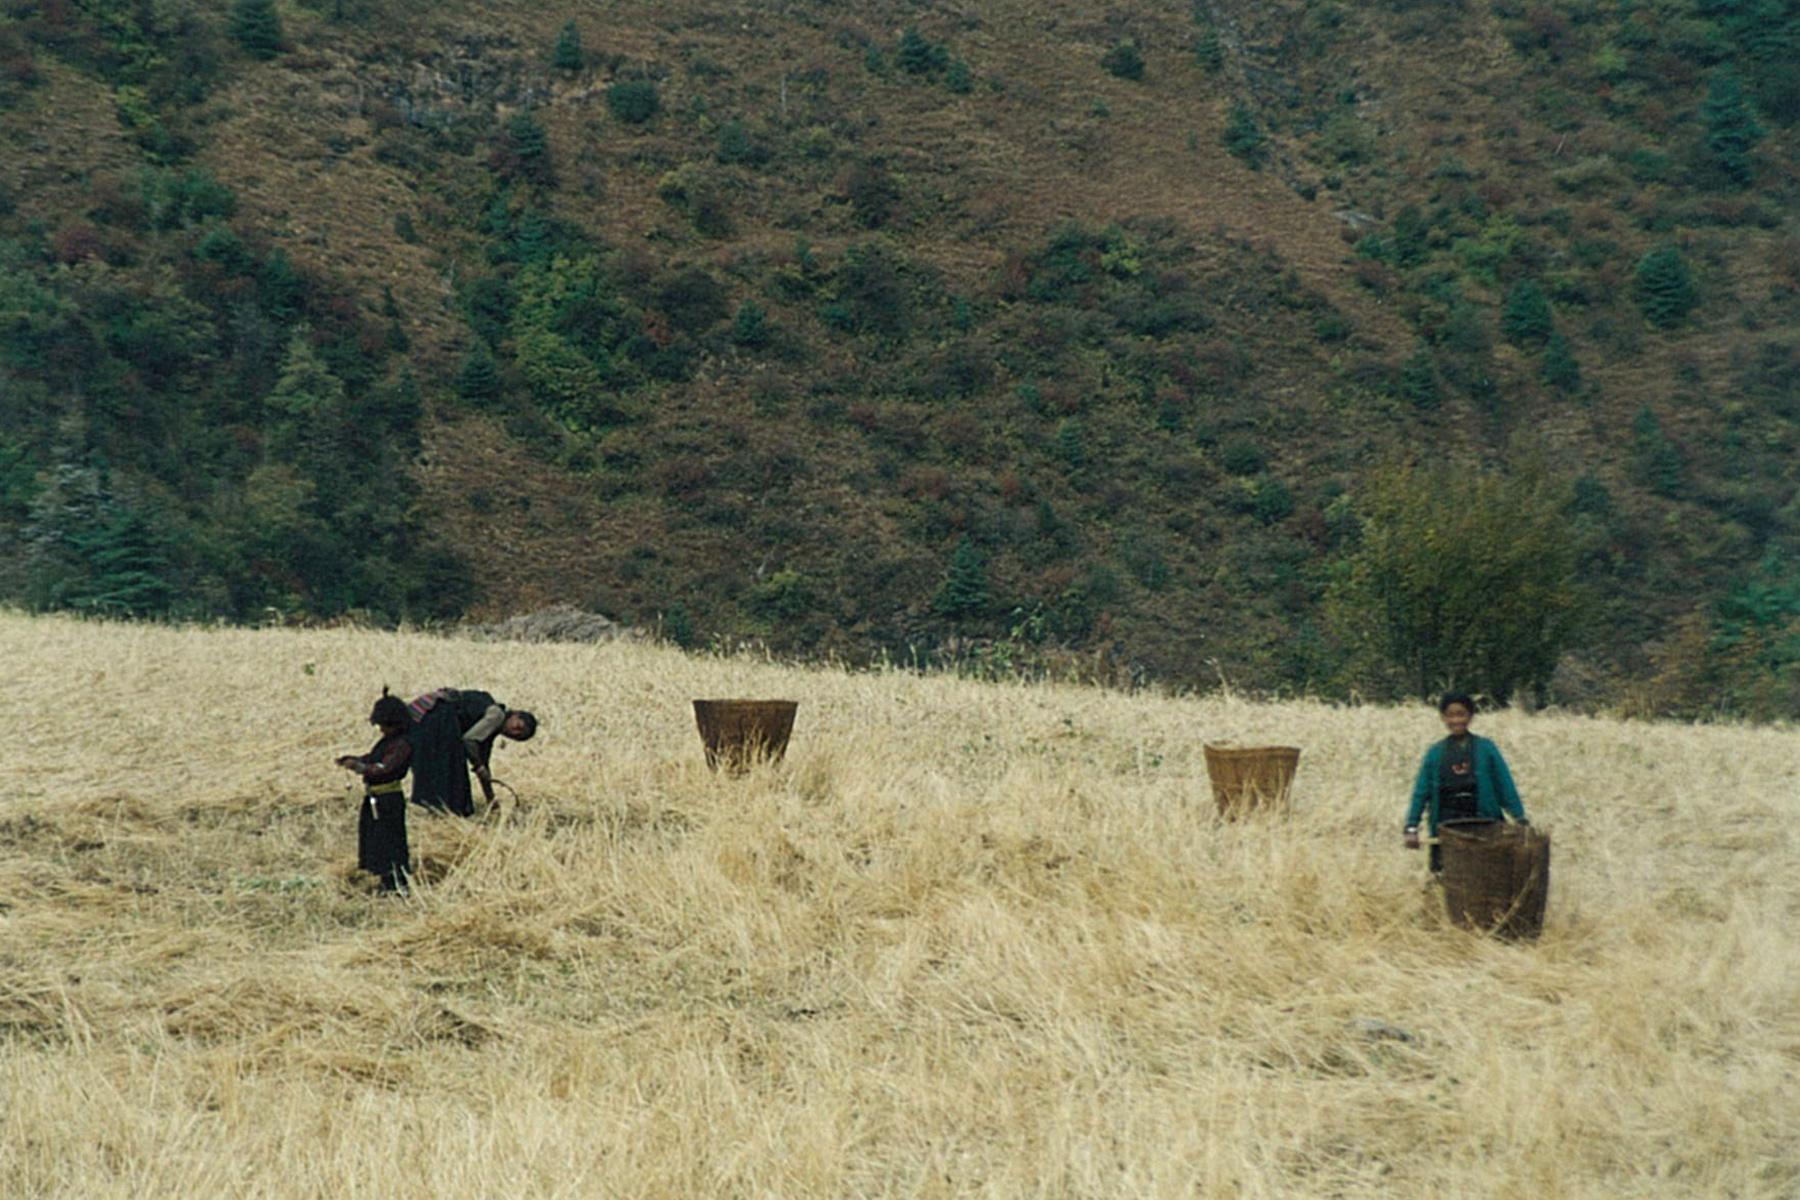 Harvest Manaslu Circuit Trek Nepal Tibetan Chuba Trekking Hike Hiking Himalayas